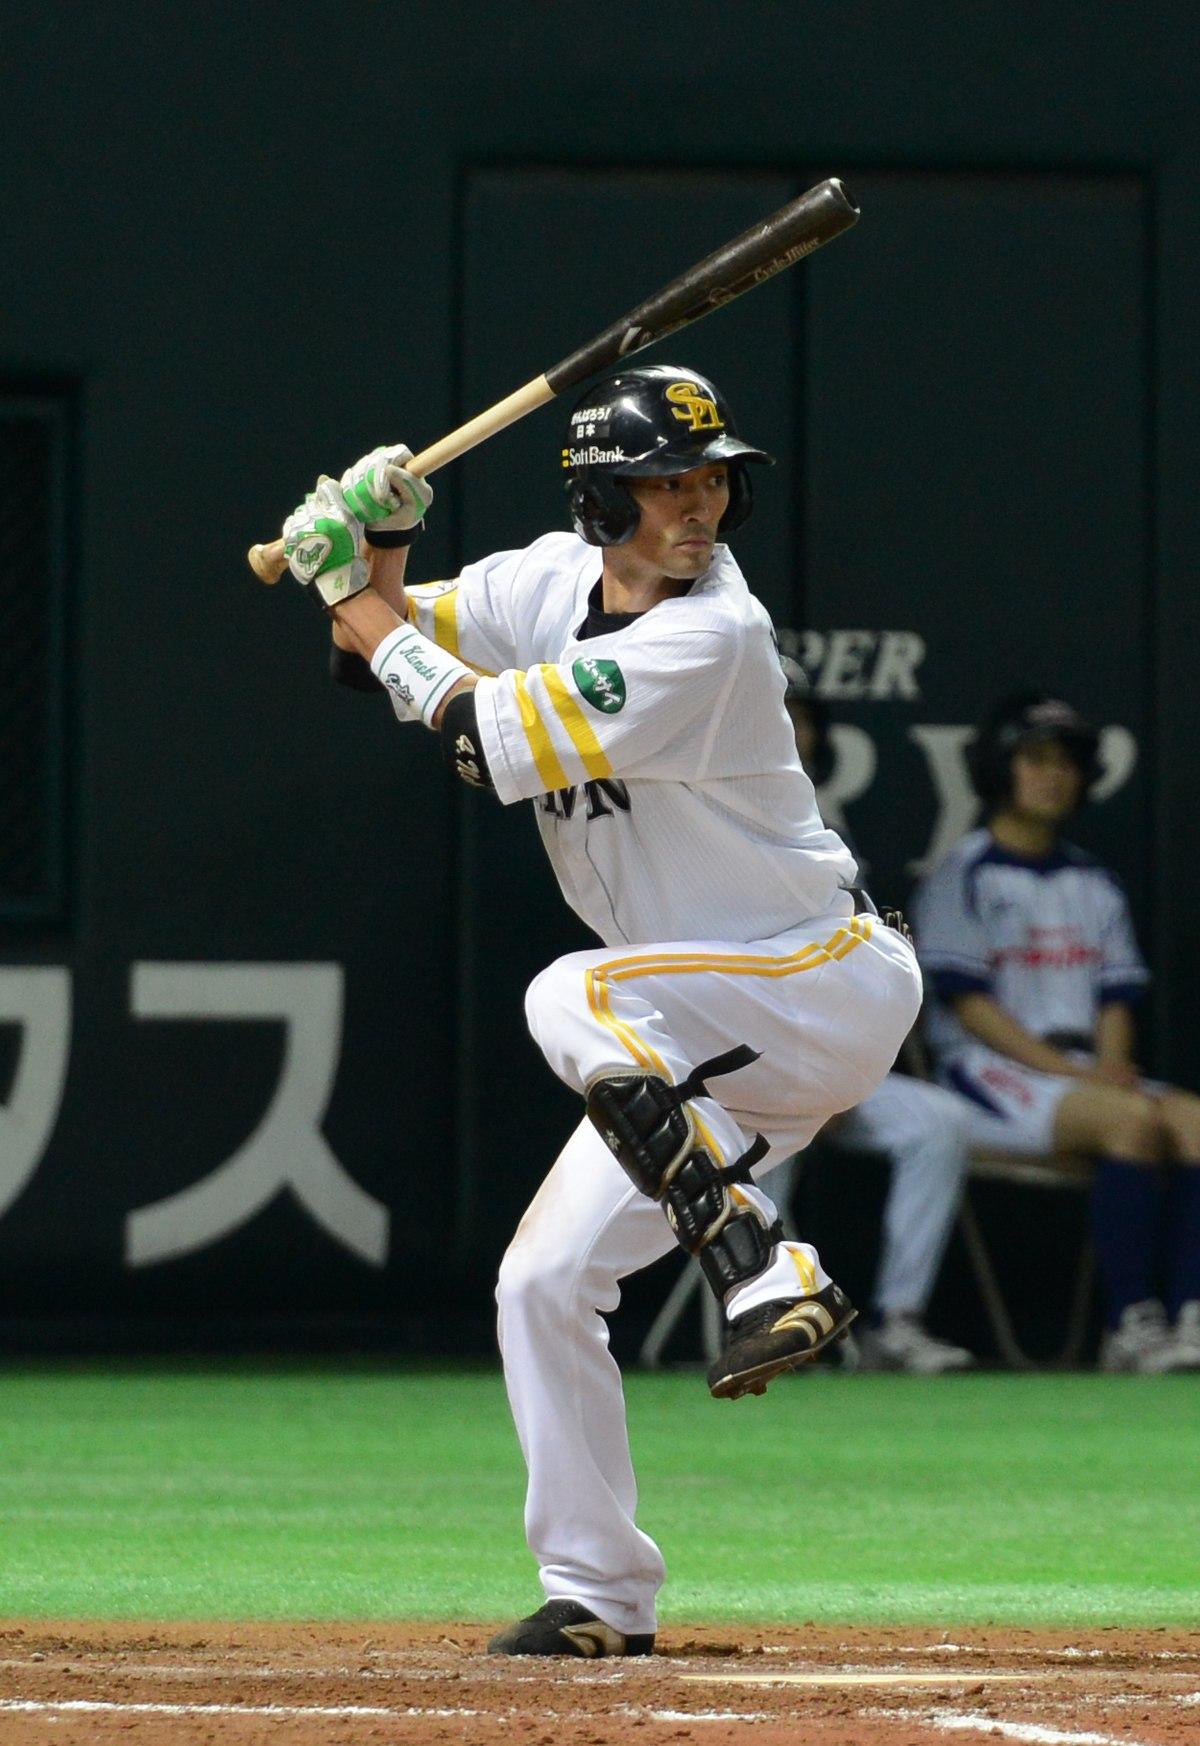 金子圭輔 - Wikipedia